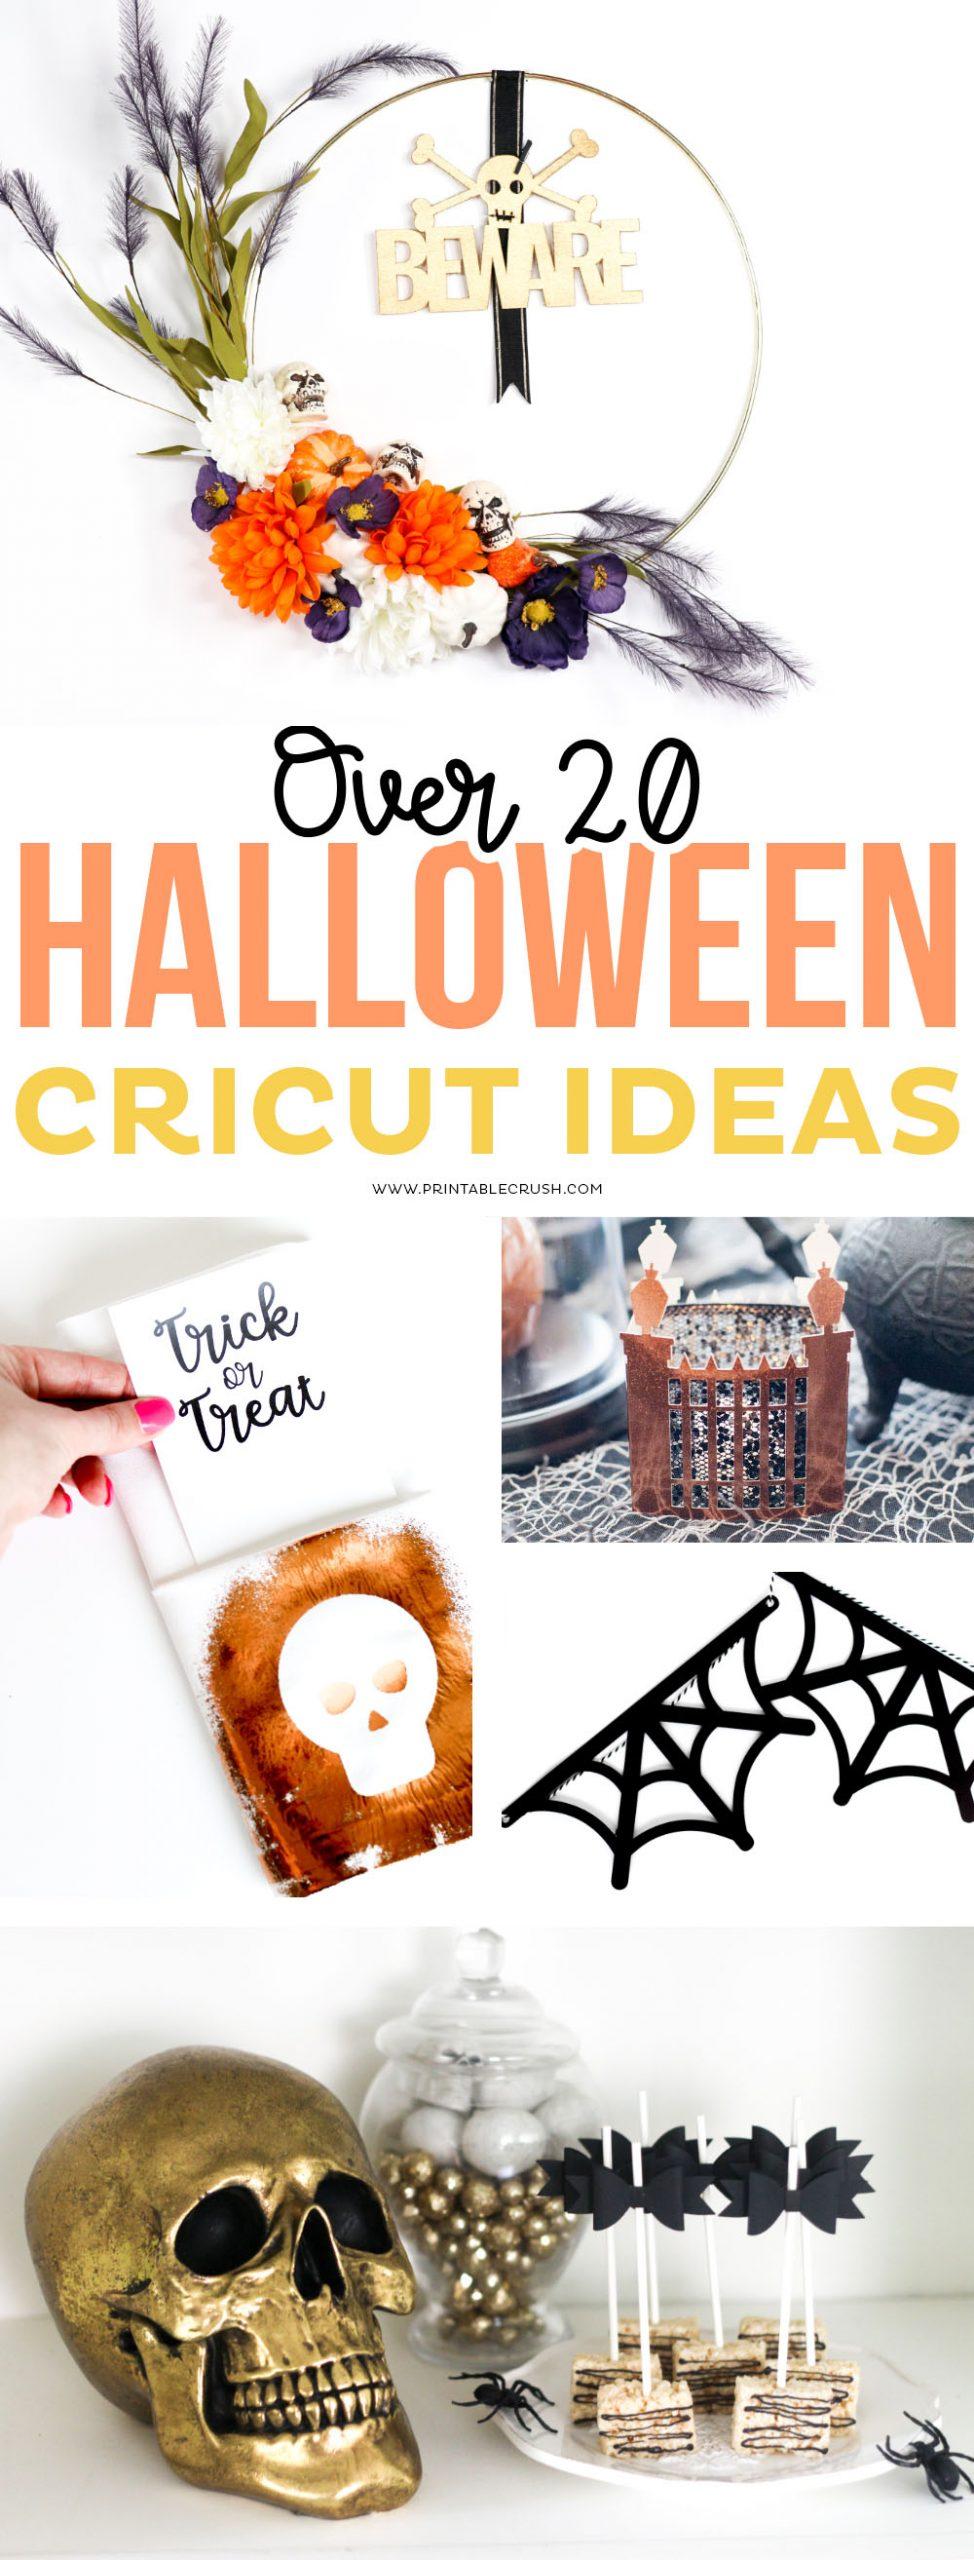 Classy Halloween Cricut Ideas for Halloween decor, Halloween parties, DIY Halloween Tutorials - Printable Crush